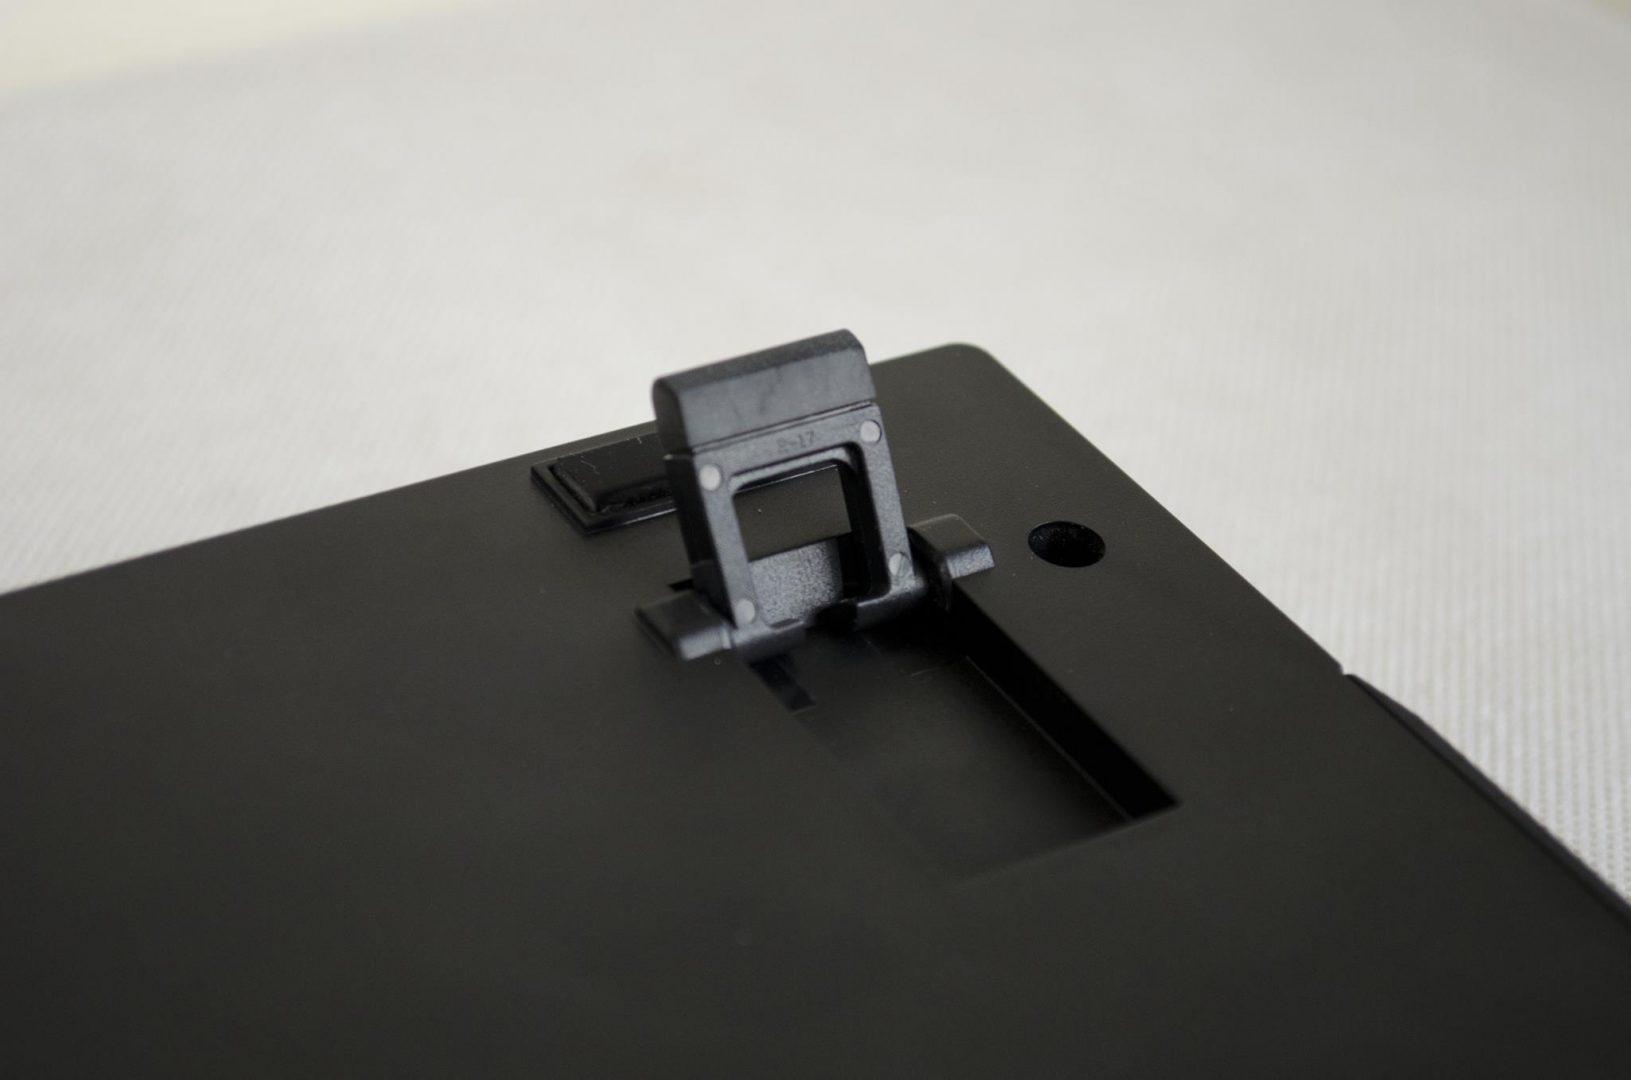 CMSTORM NovaTouch TKL Hybrid Capacitive Switch Keyboard Review_6